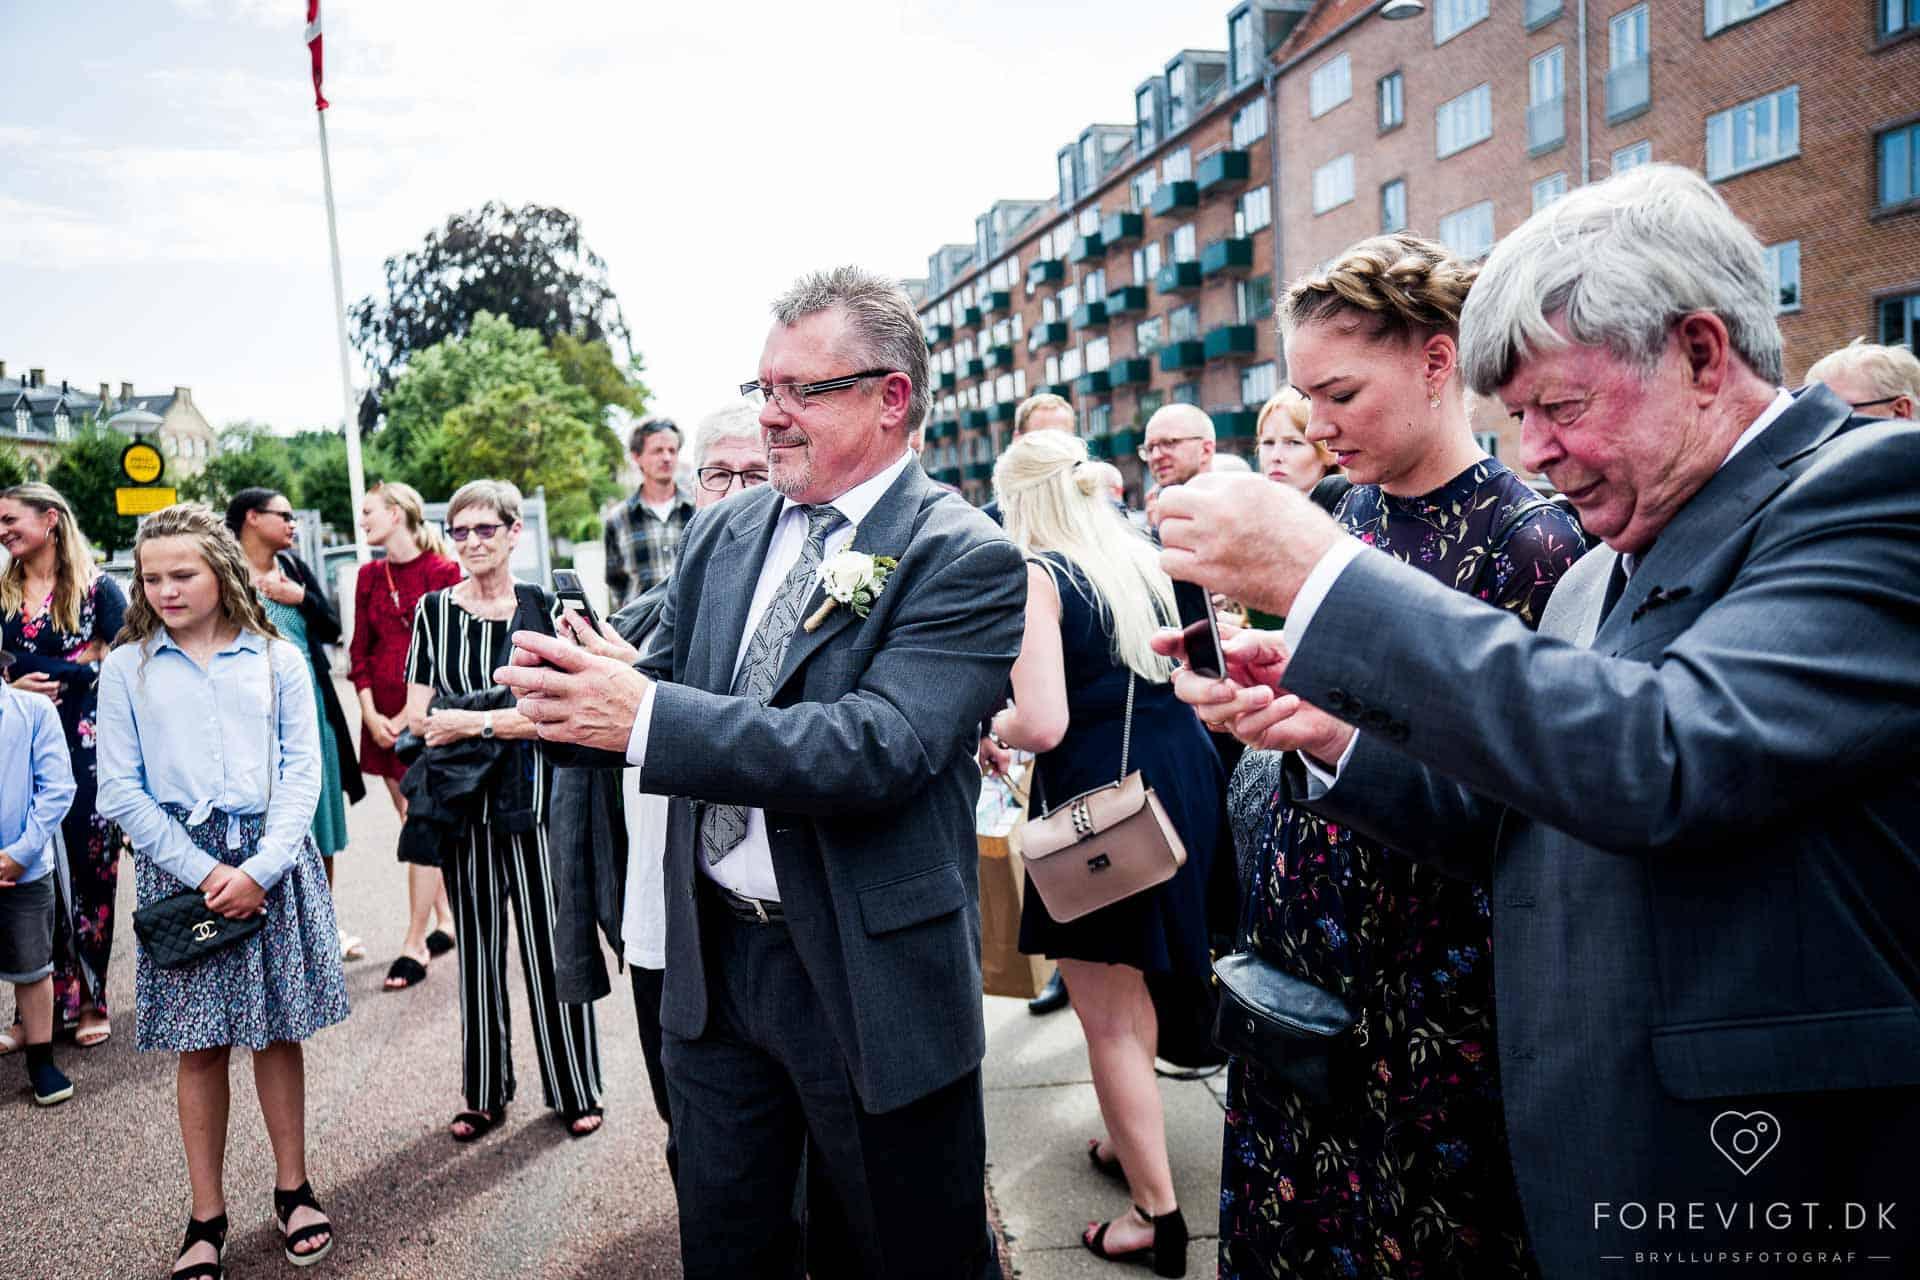 Bryllup i indre KBH - Bryllupsfotograf